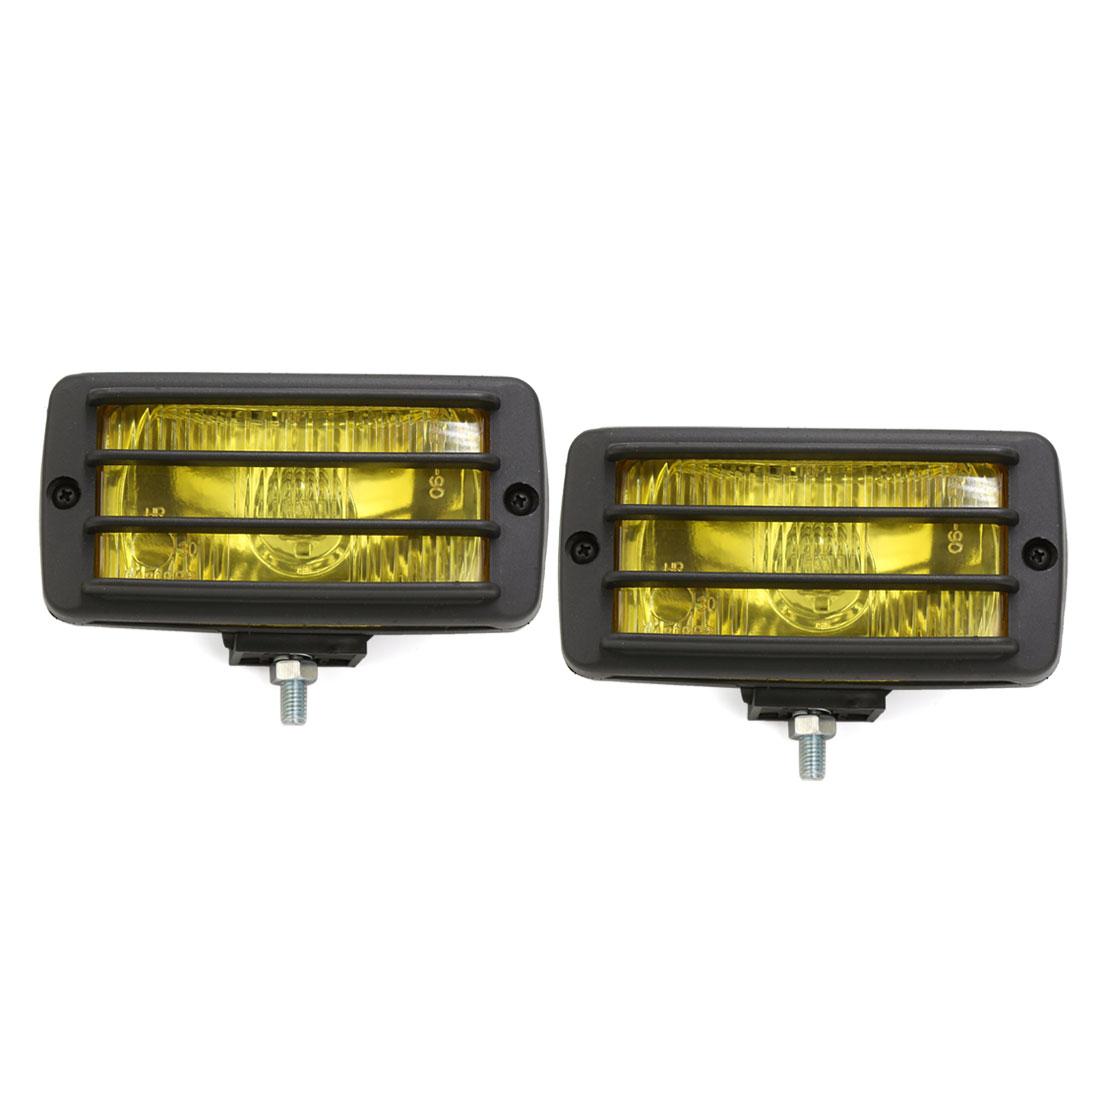 2 Pcs Black Shell H3 Yellow Halogen Light Fog Head Lamp DC 12V 55W for Car